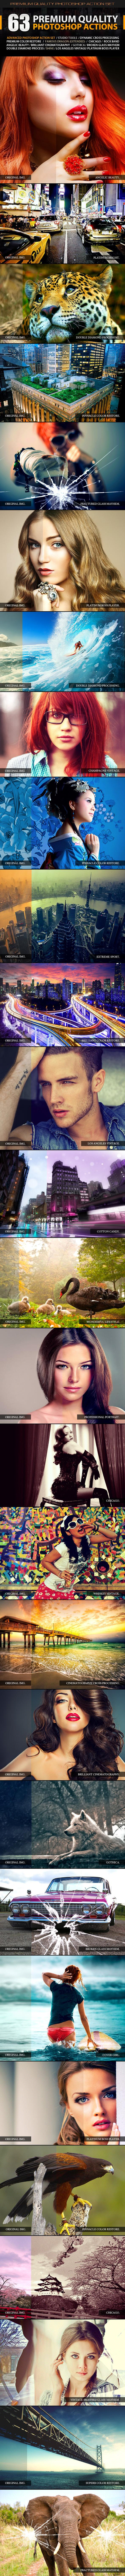 63 Premium Quality Photoshop Actions - Actions Photoshop